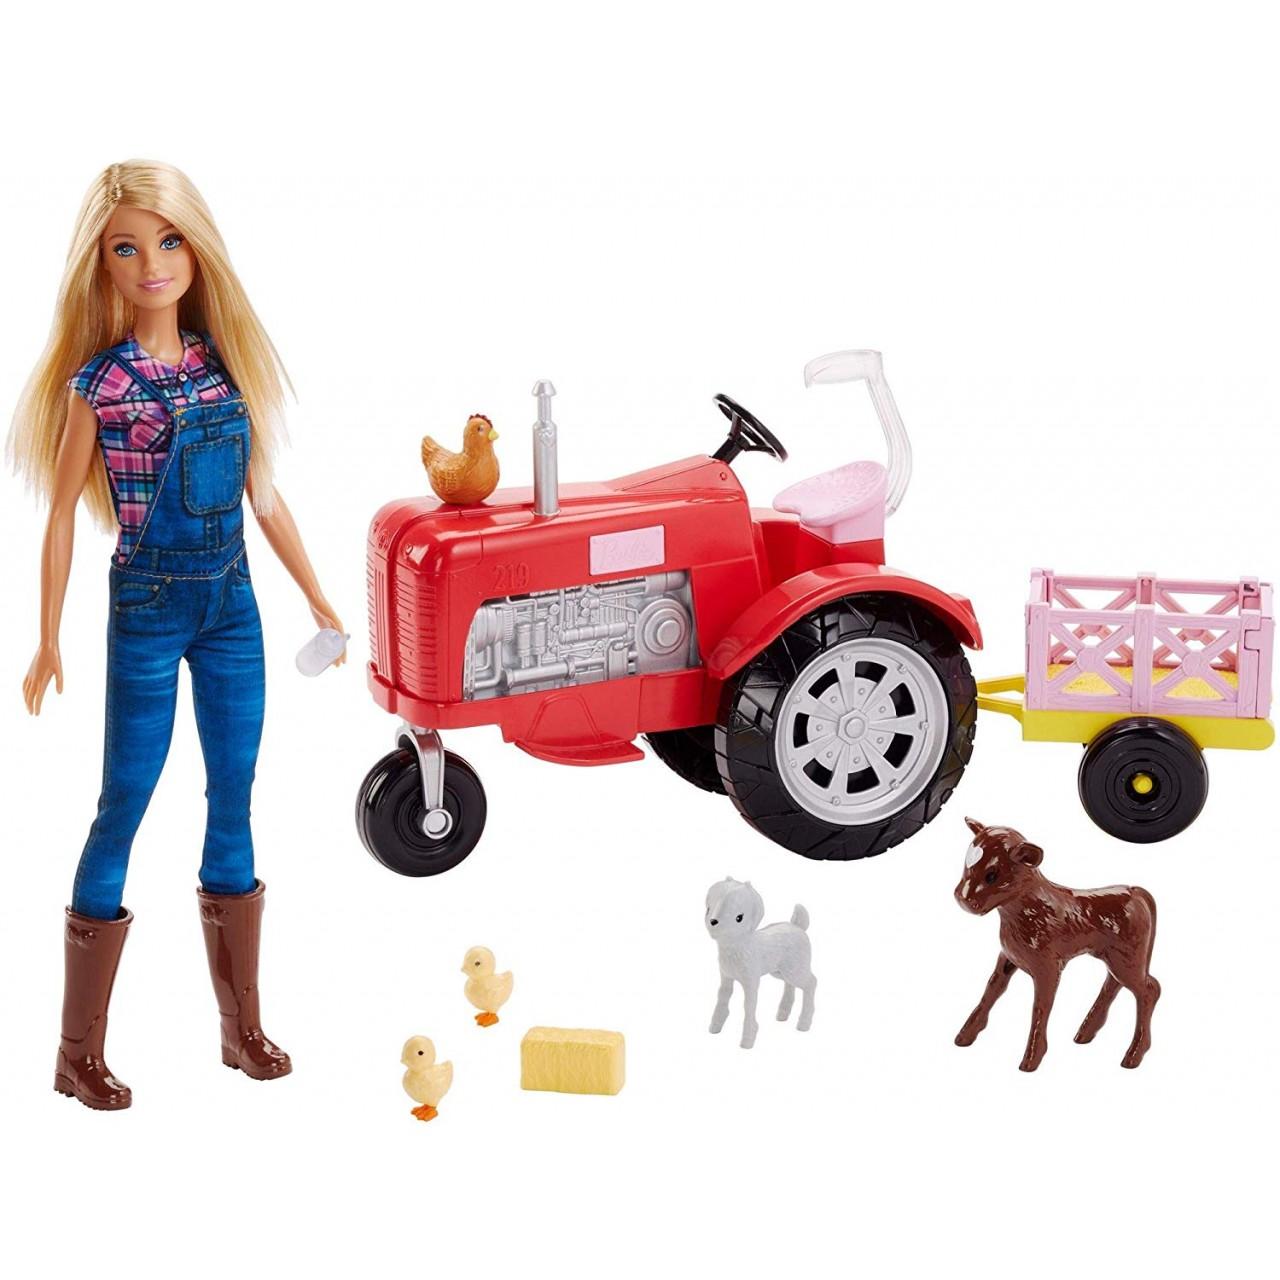 Ігровий набір Барбі Фермер на тракторі (FRM18) Barbie Doll and Tractor